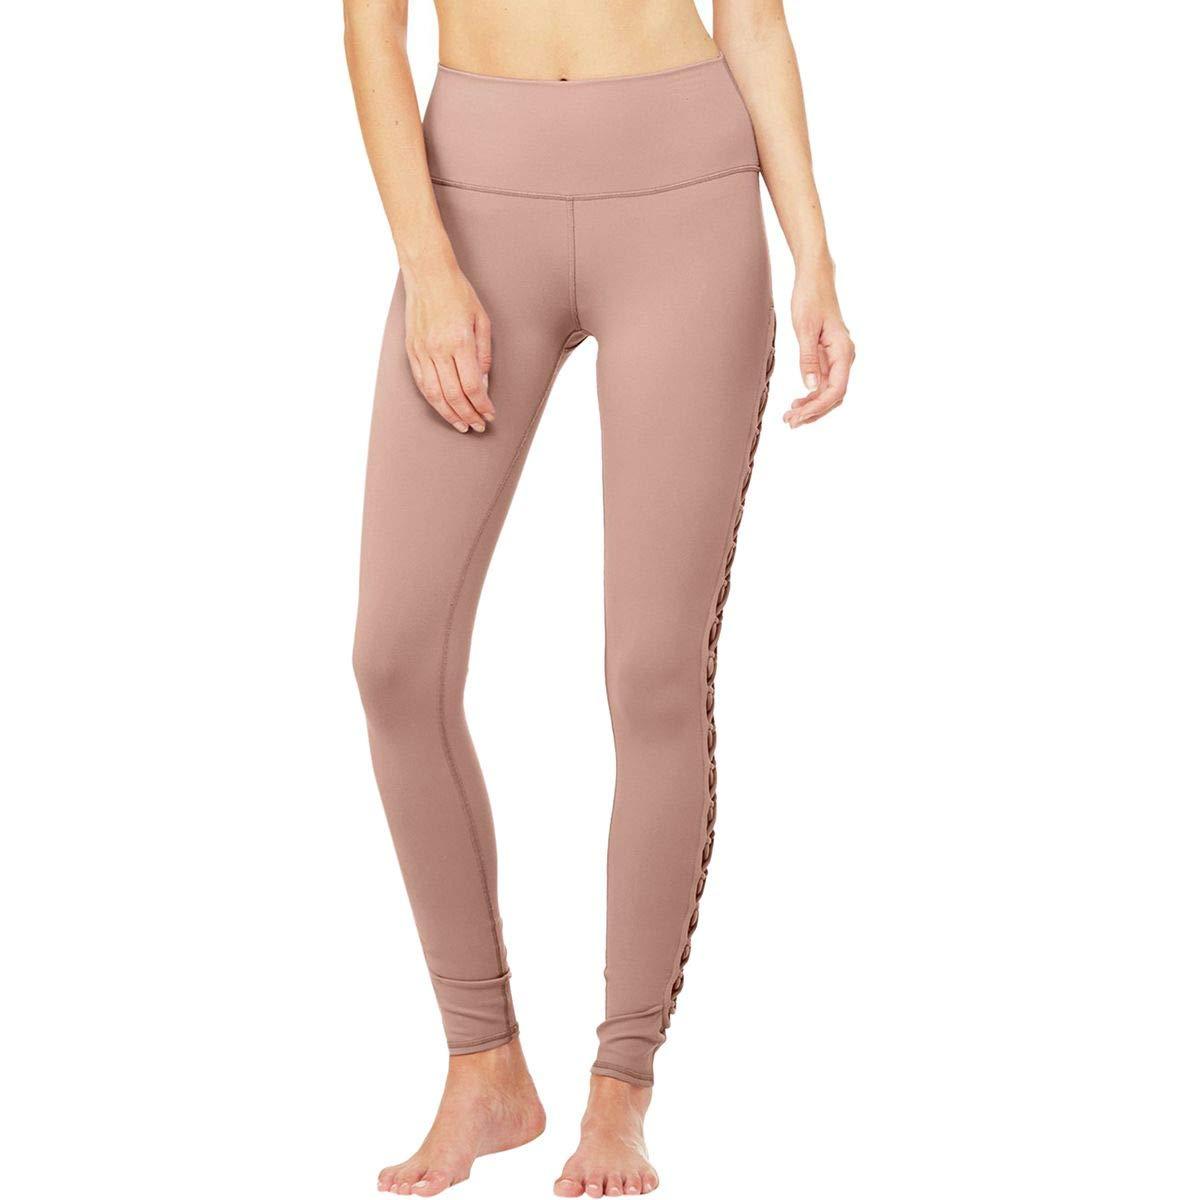 b26e68a7958d36 ALO Women's High Waist Airbrushed Leggings at Amazon Women's Clothing store: